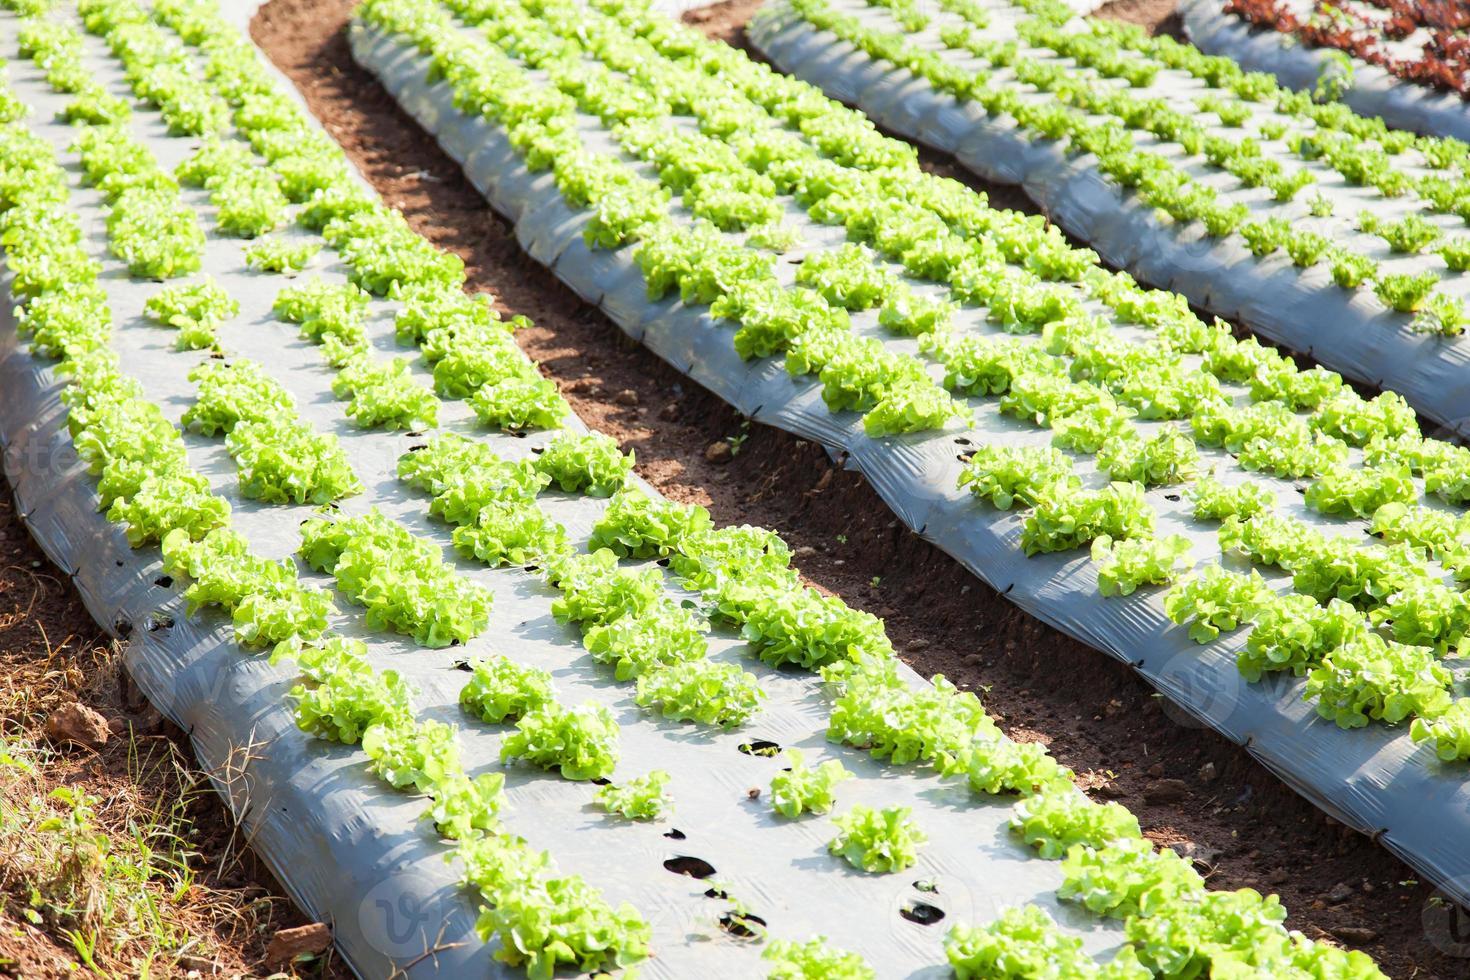 Gemüse in Parzellen gepflanzt foto